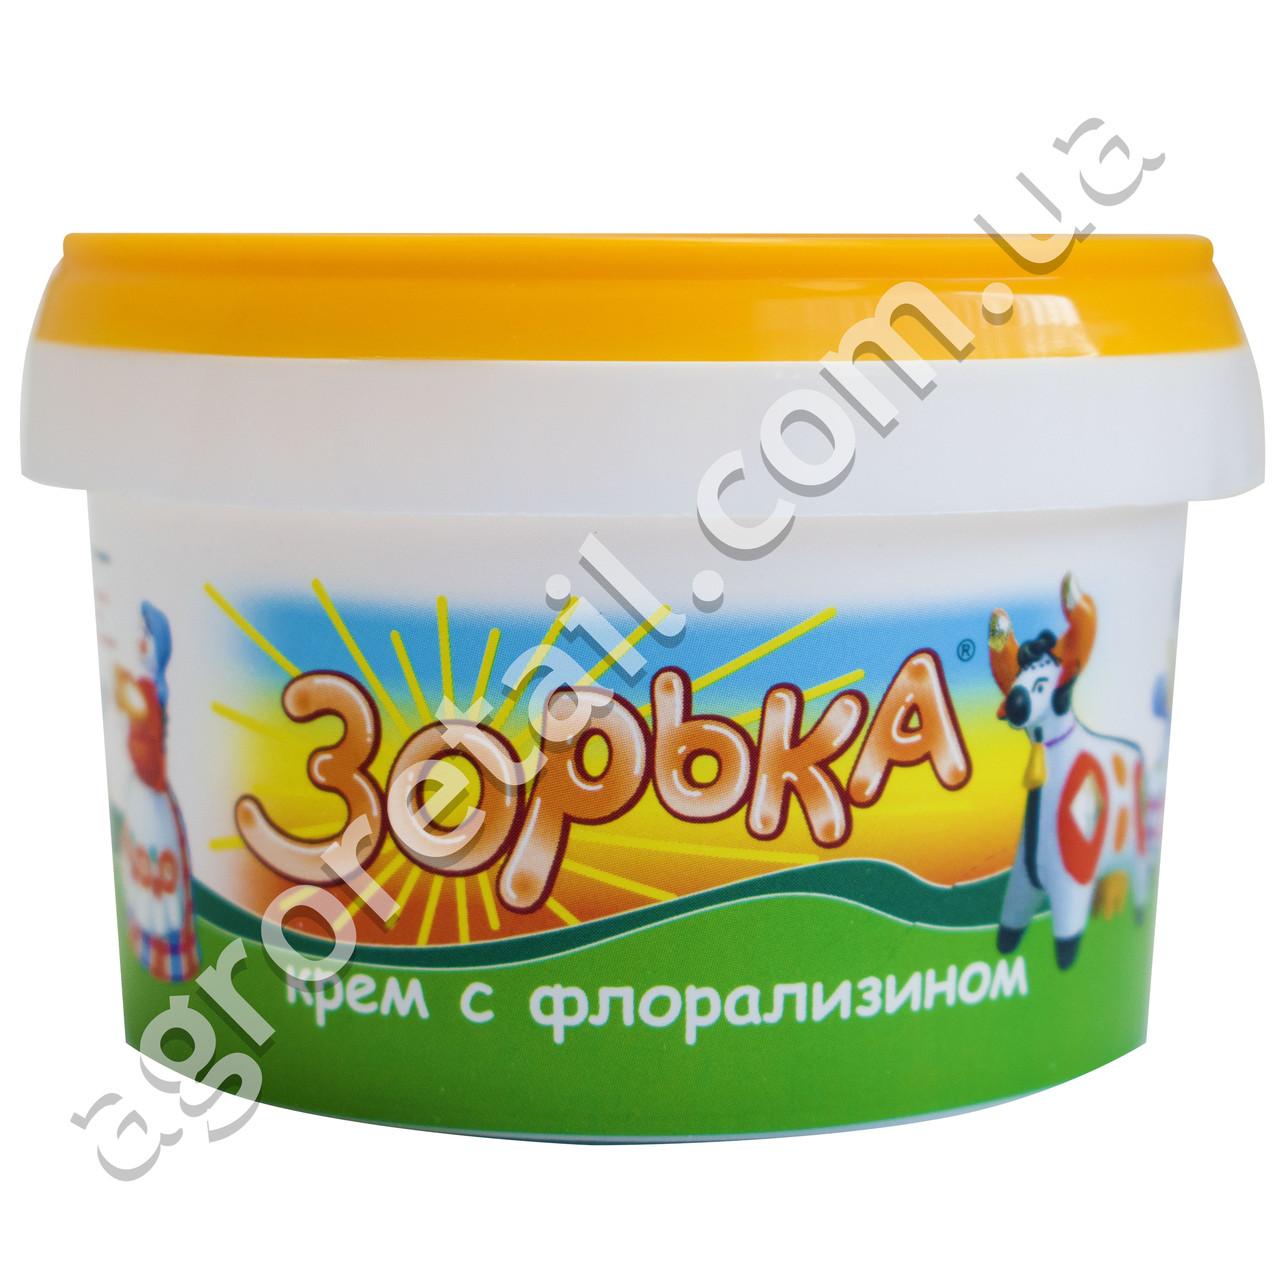 Зорька крем с флорализином 200 г Фармакс